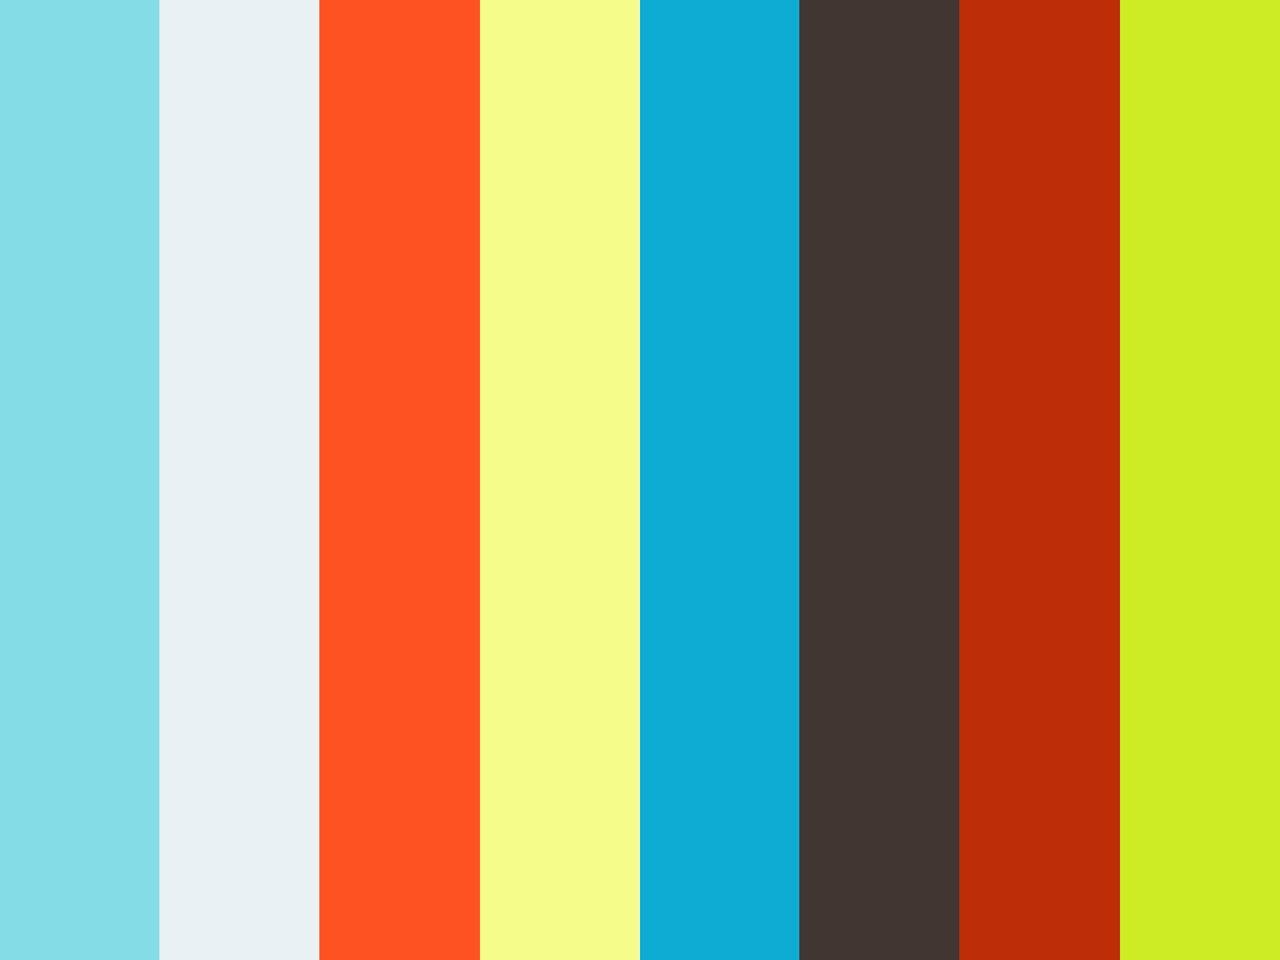 Inverde - De Kamsalamander